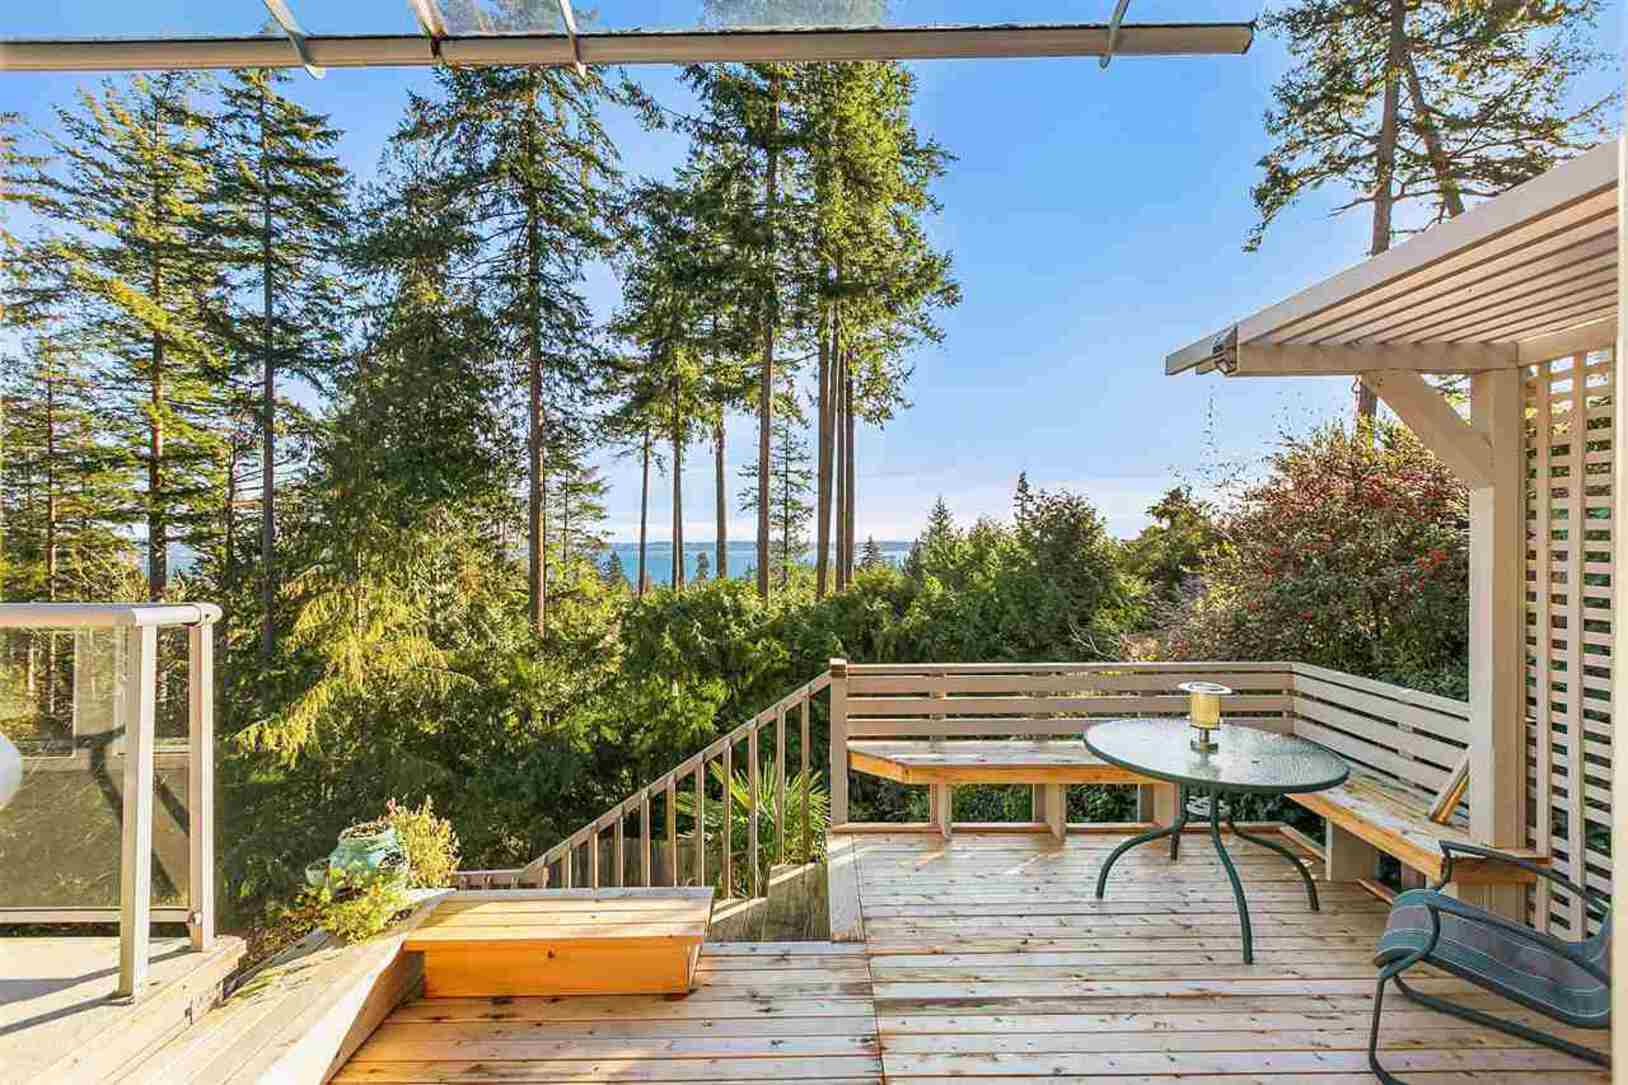 4864-vista-place-caulfeild-west-vancouver-13 at 4864 Vista Place, Caulfeild, West Vancouver